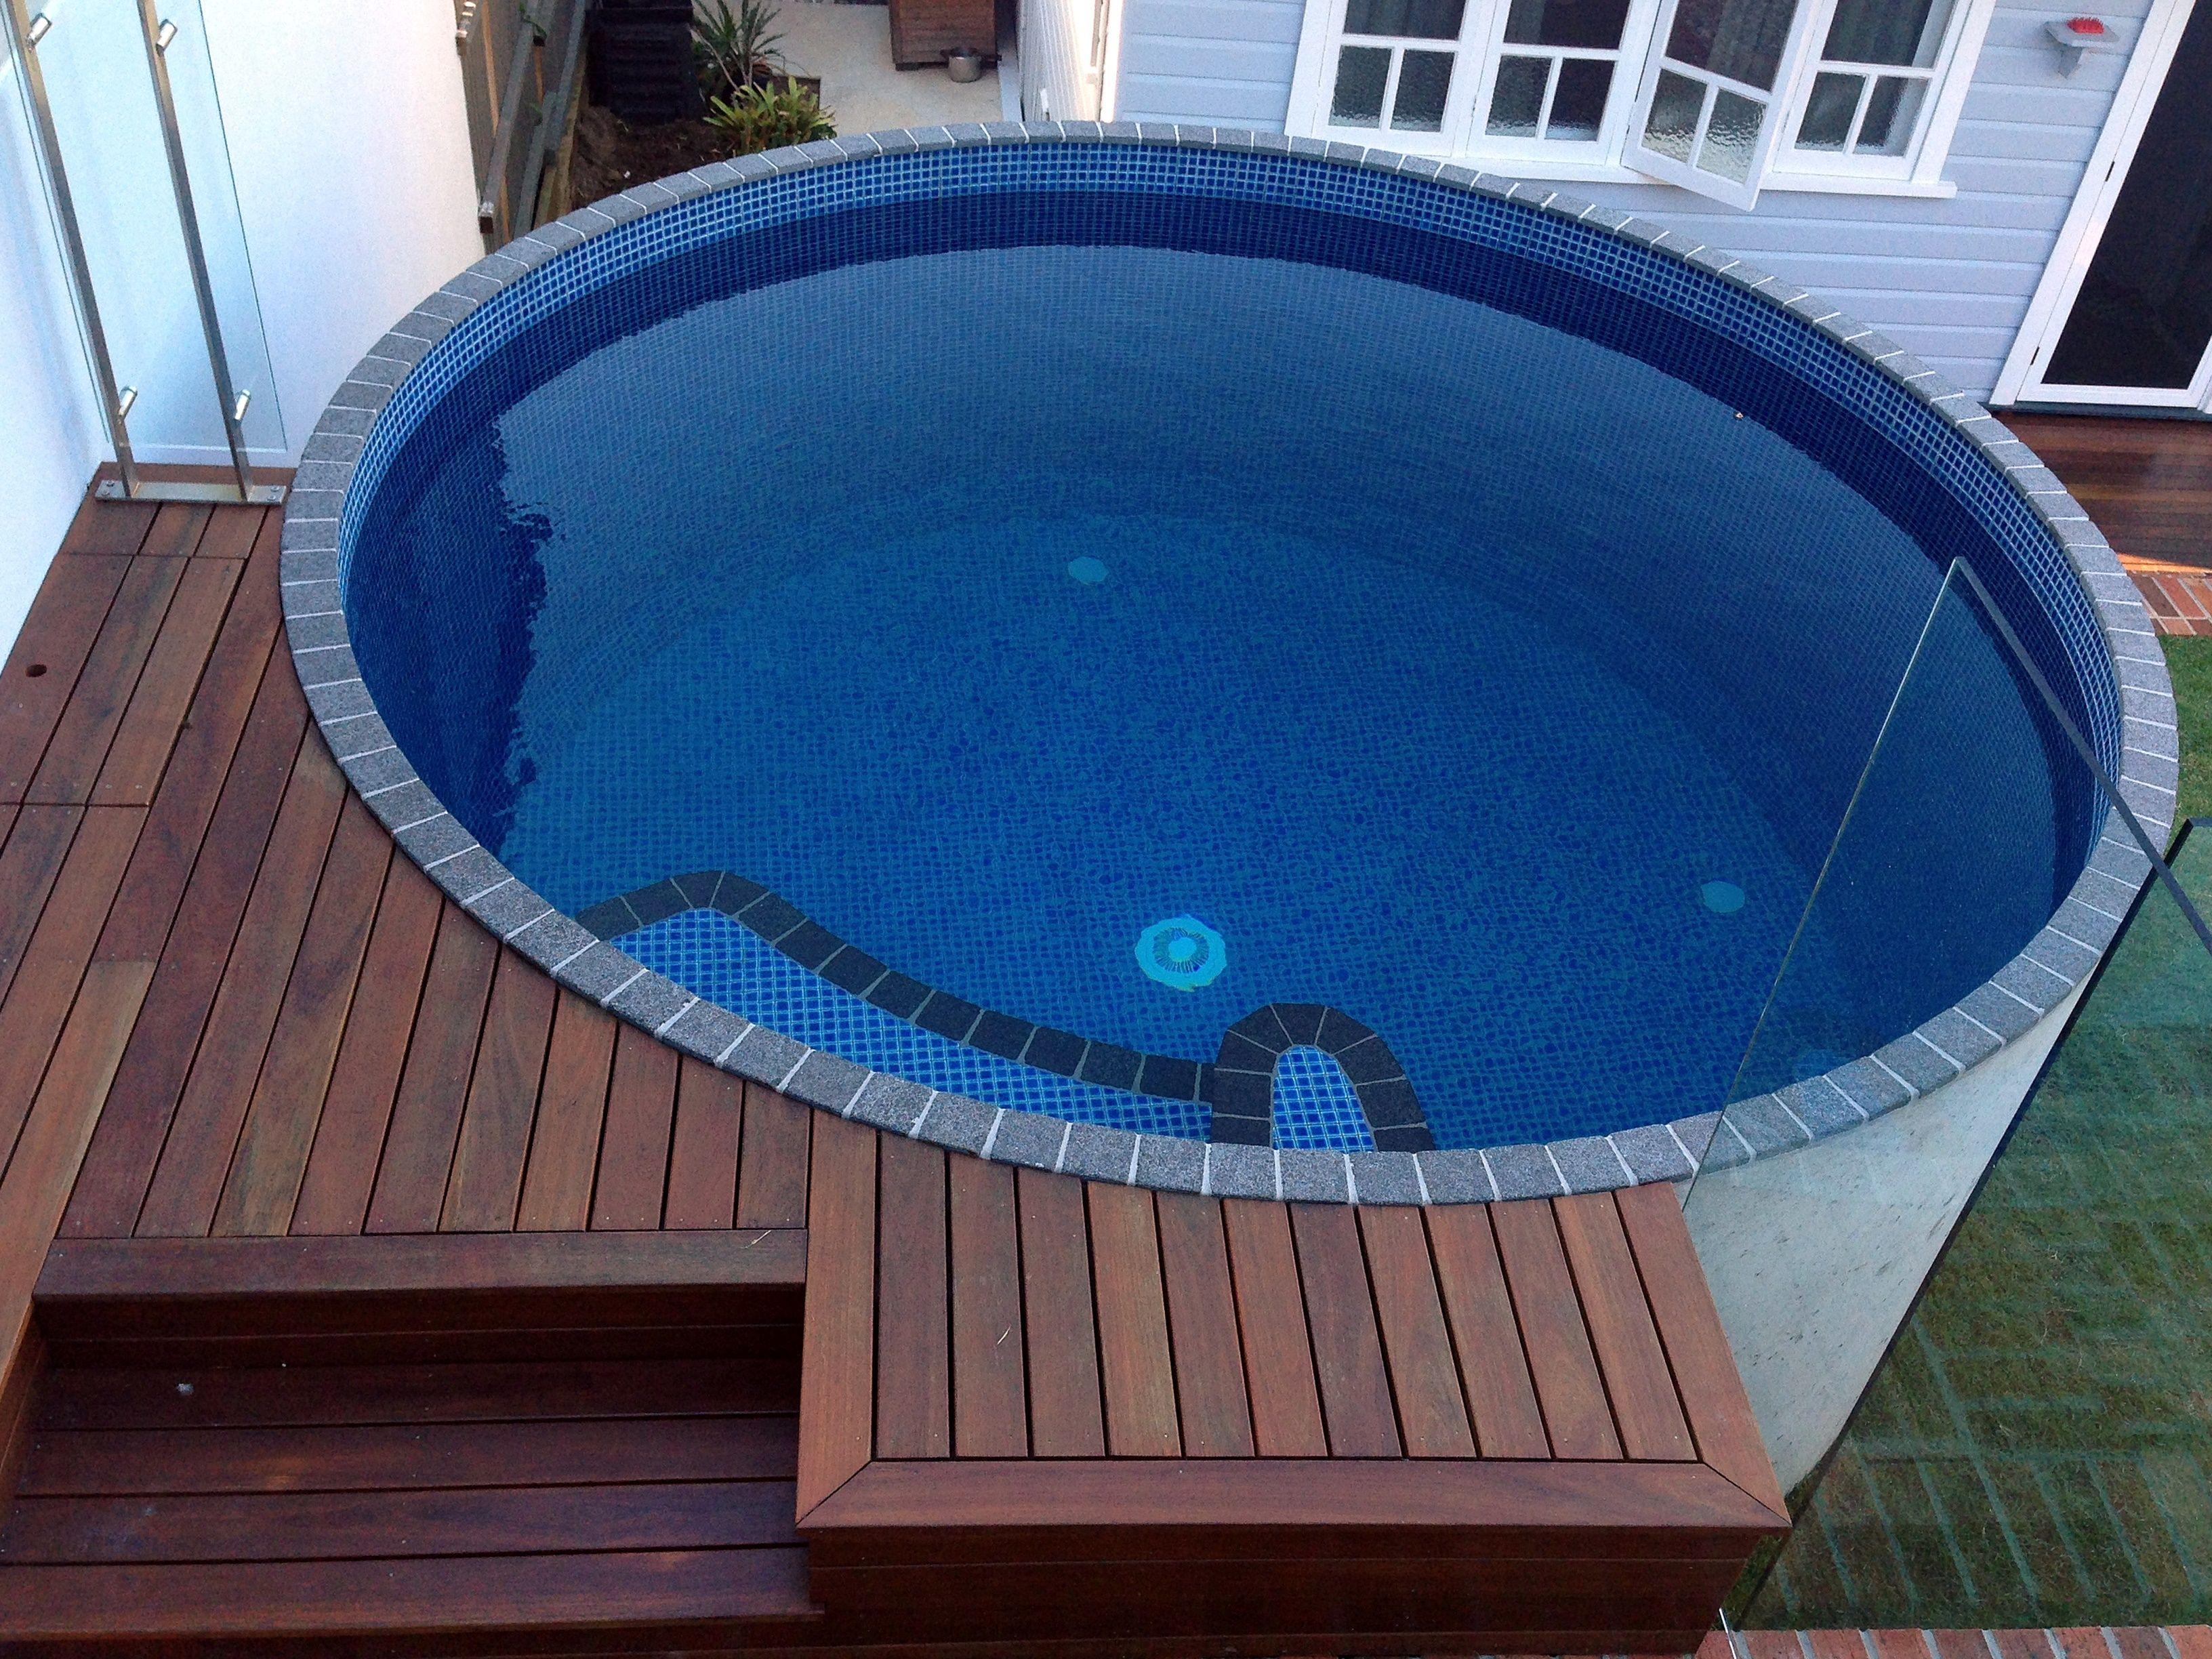 Brisbane Australian Plunge Pool